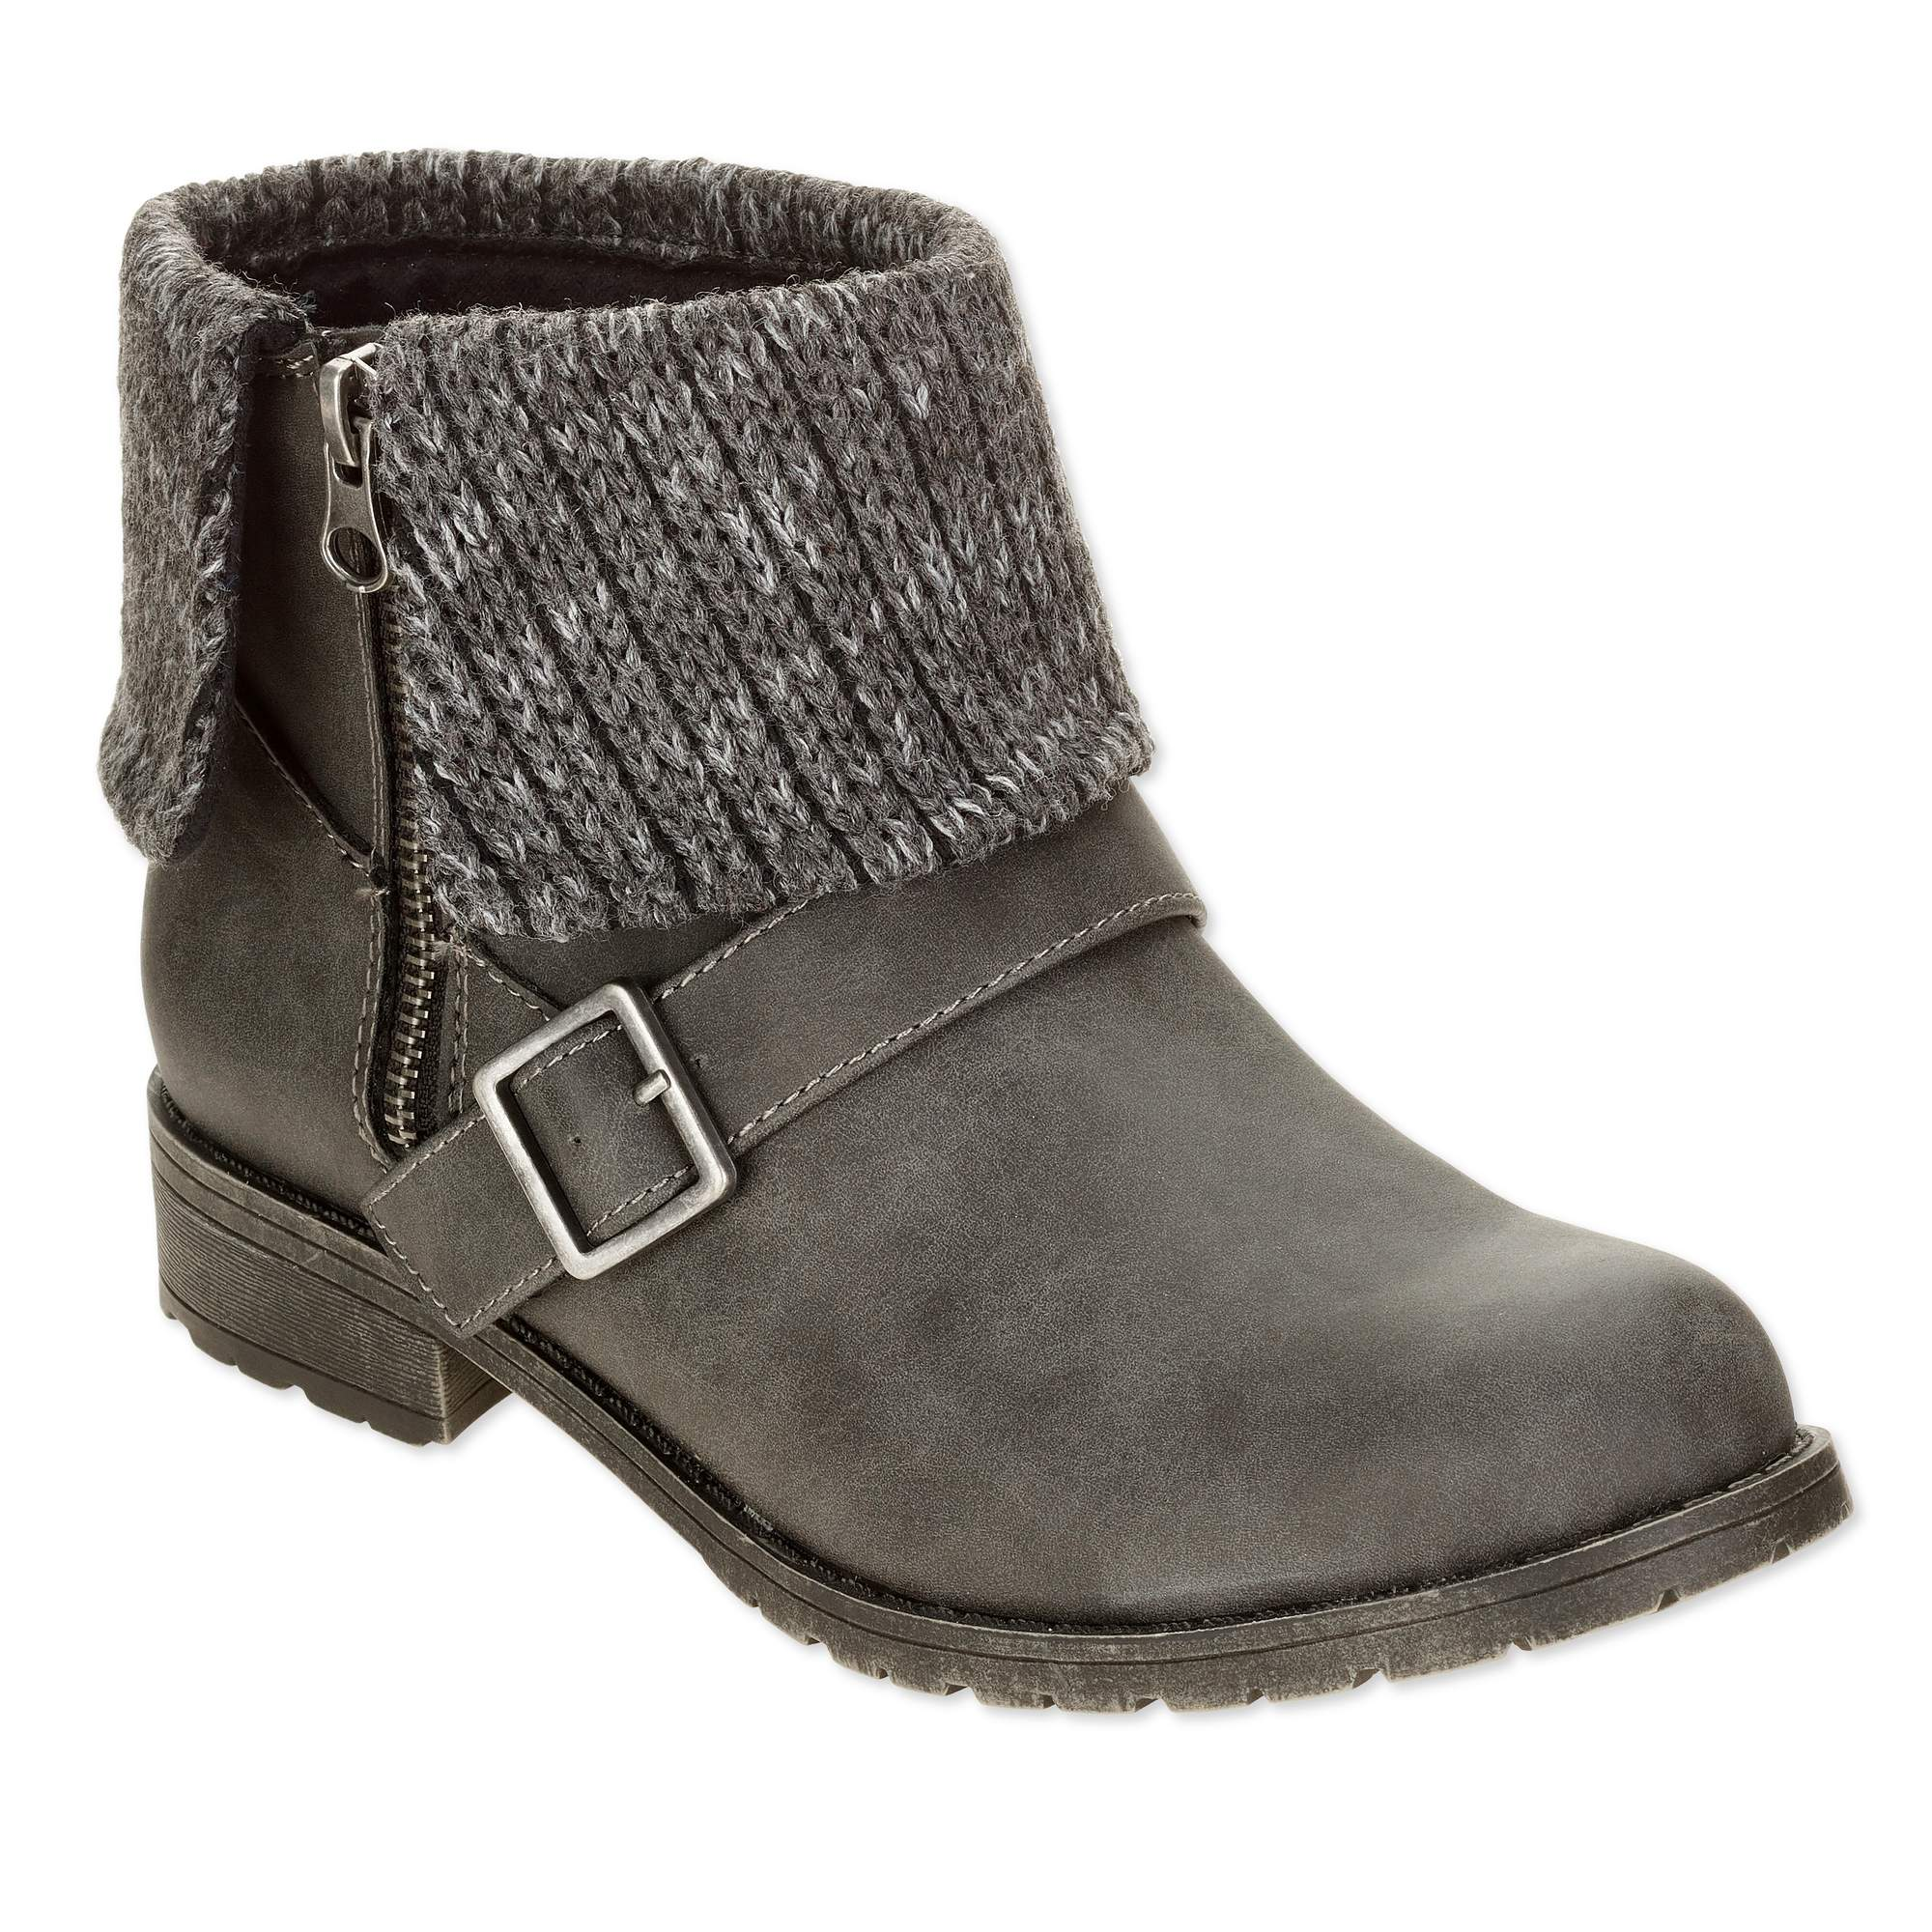 Stella Chase Women's Bobo Boot